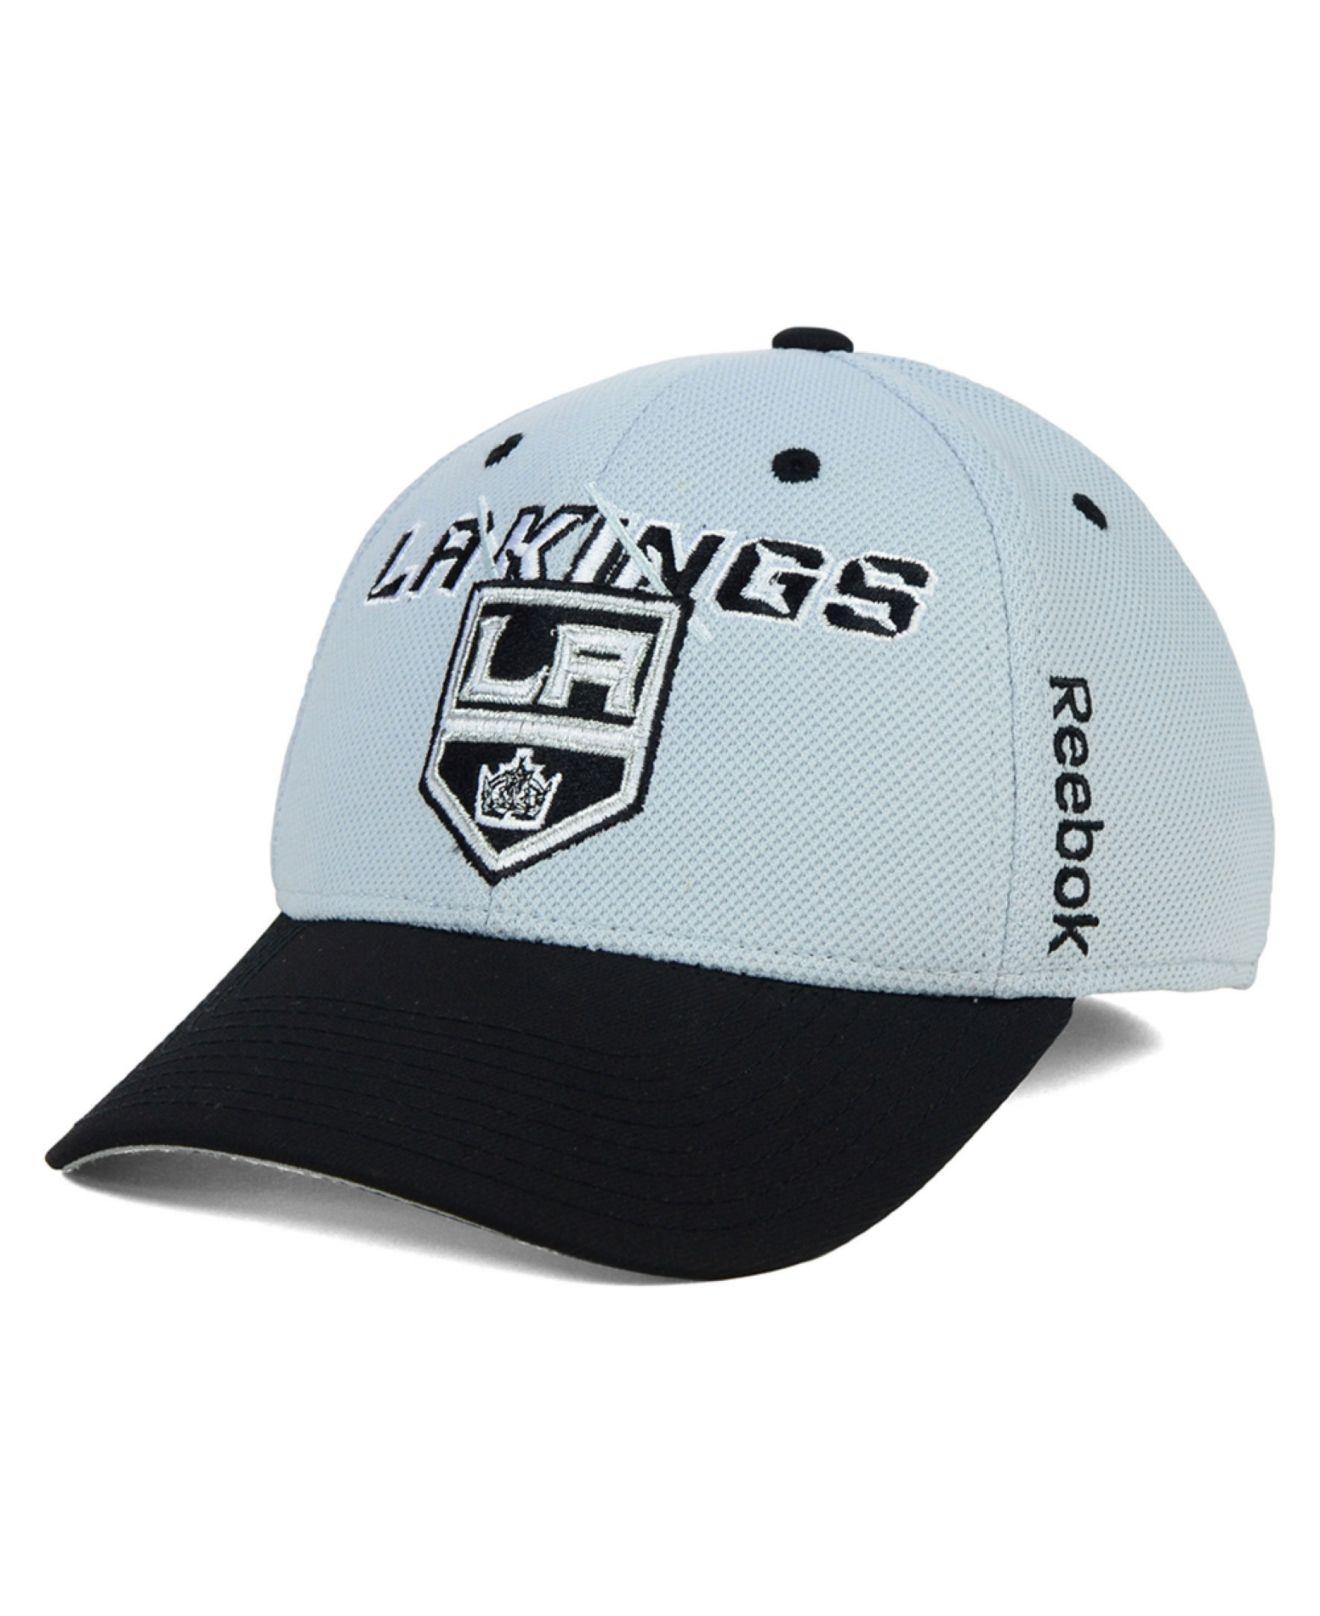 competitive price b95e2 1d3ba Lyst - Reebok Los Angeles Kings 2nd Season Flex Cap in Gray for Men